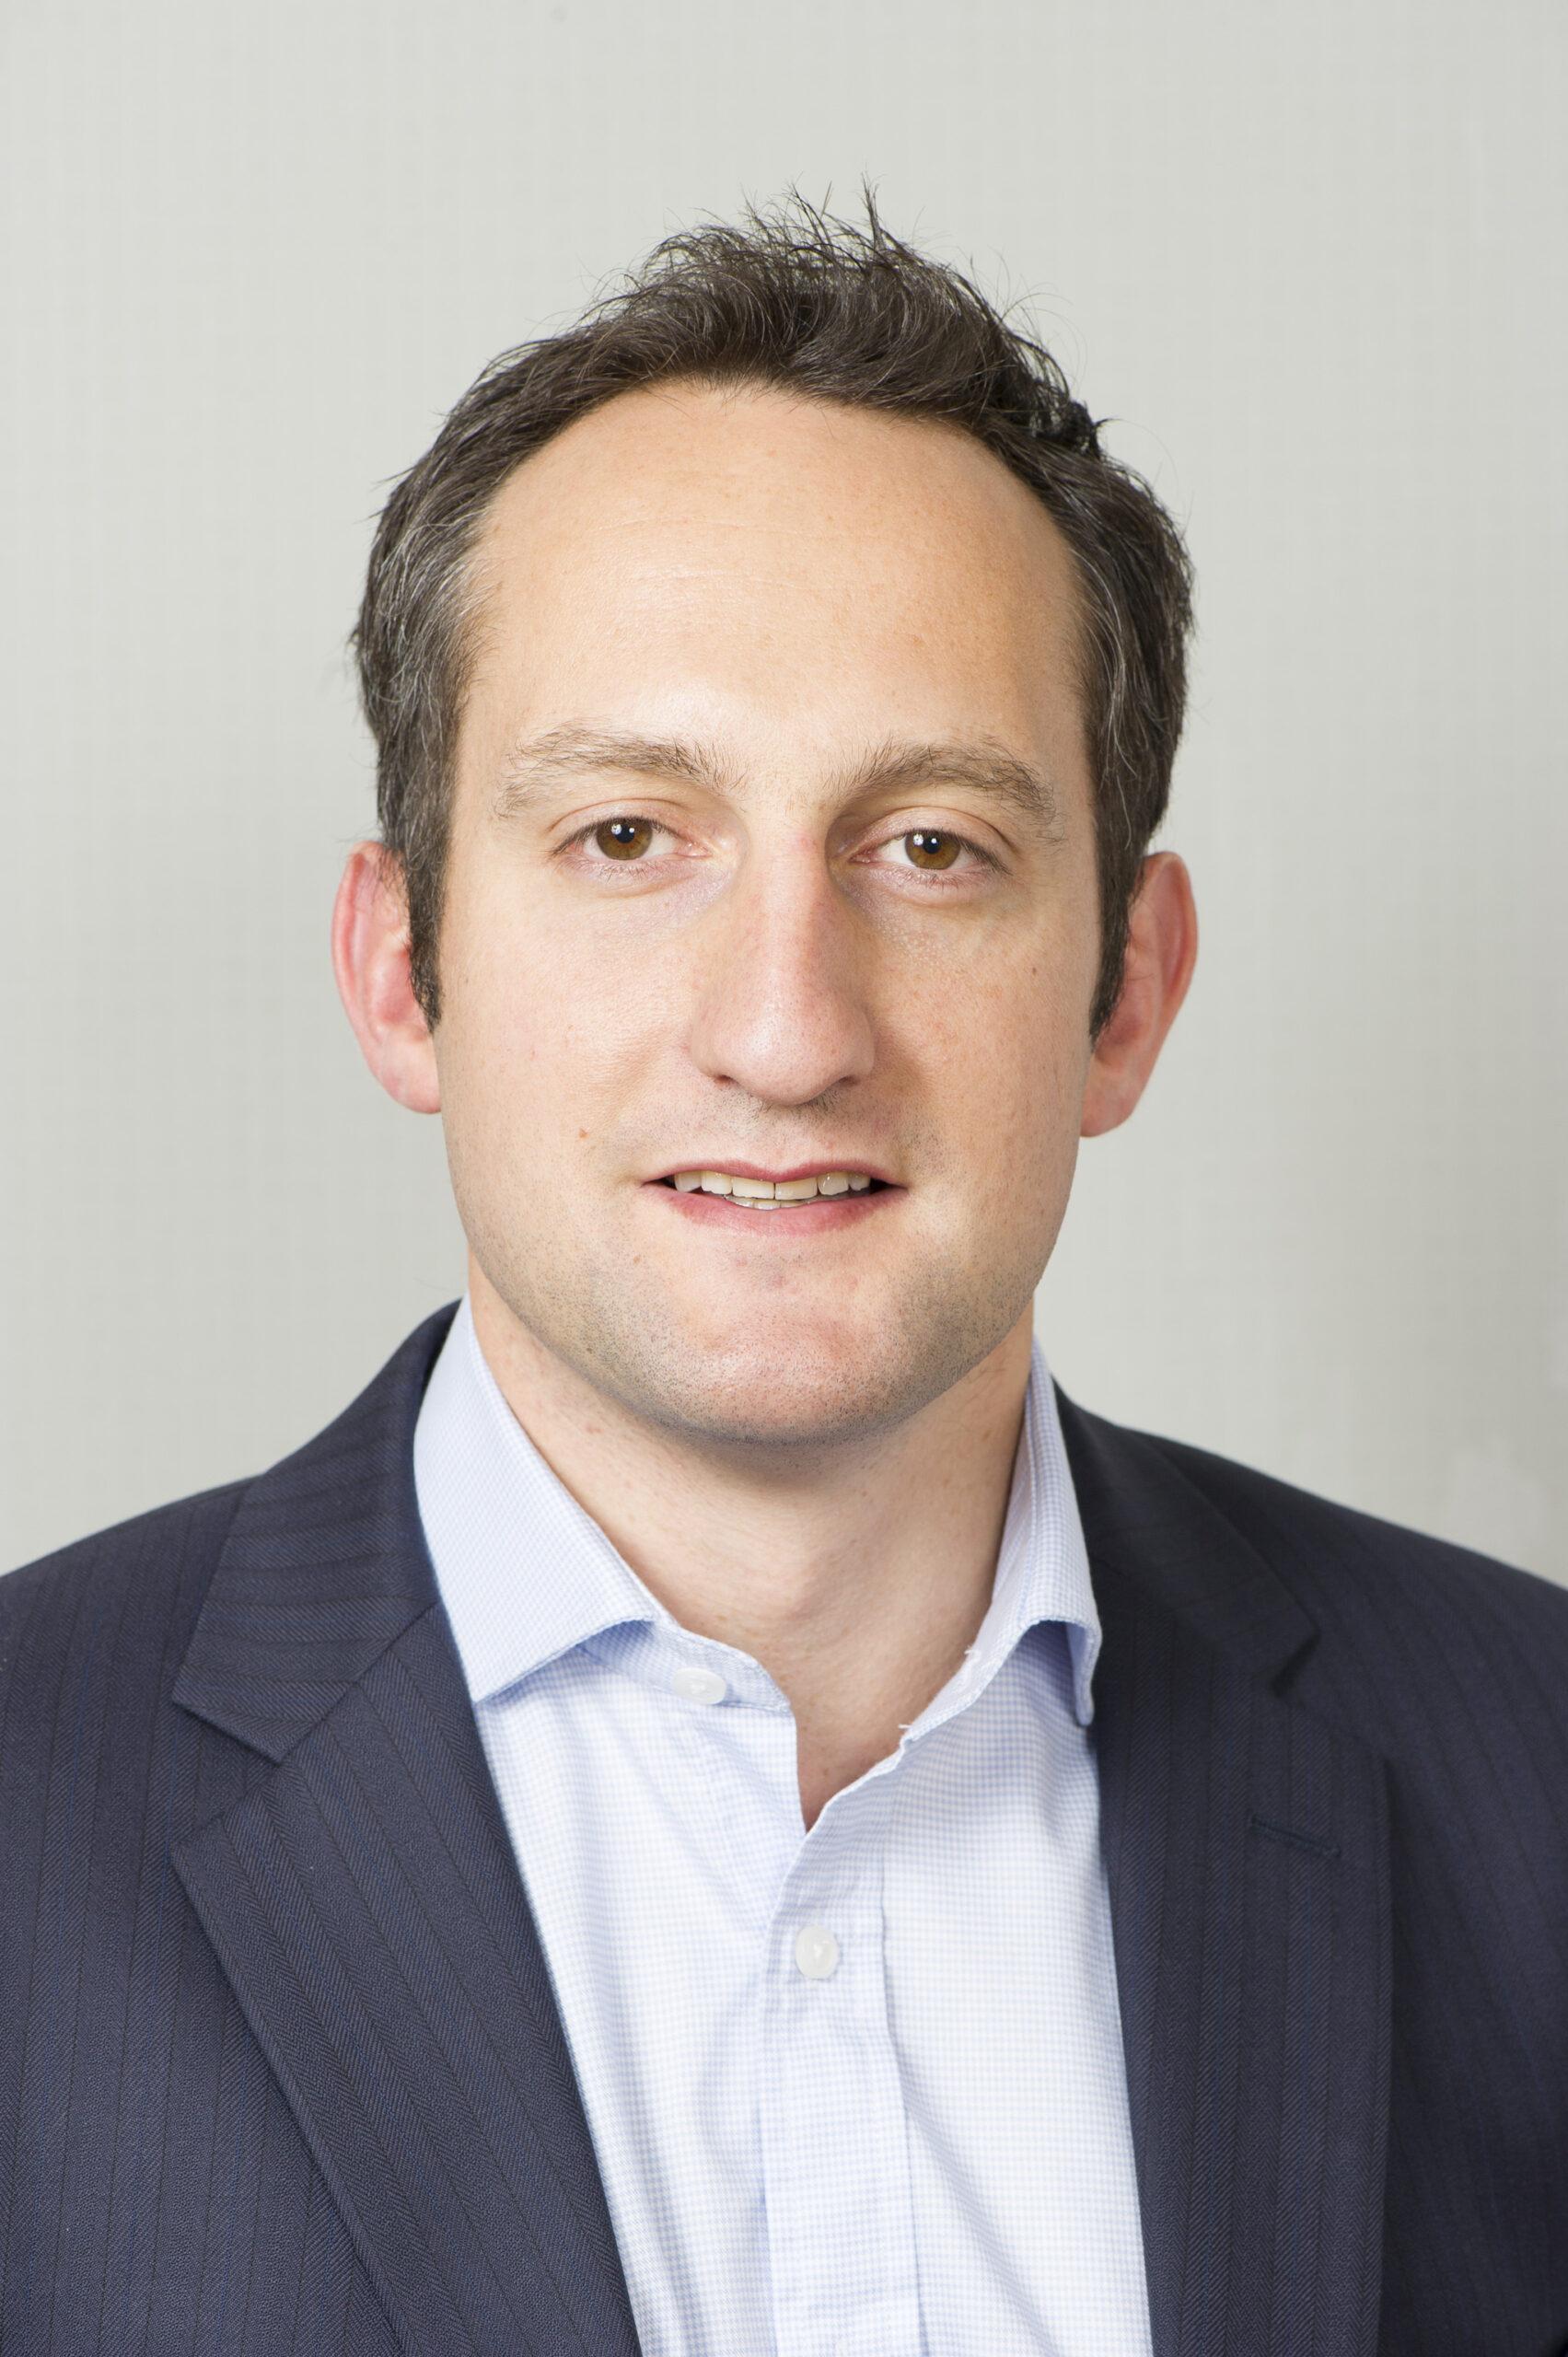 Headshot of Paul Marchand